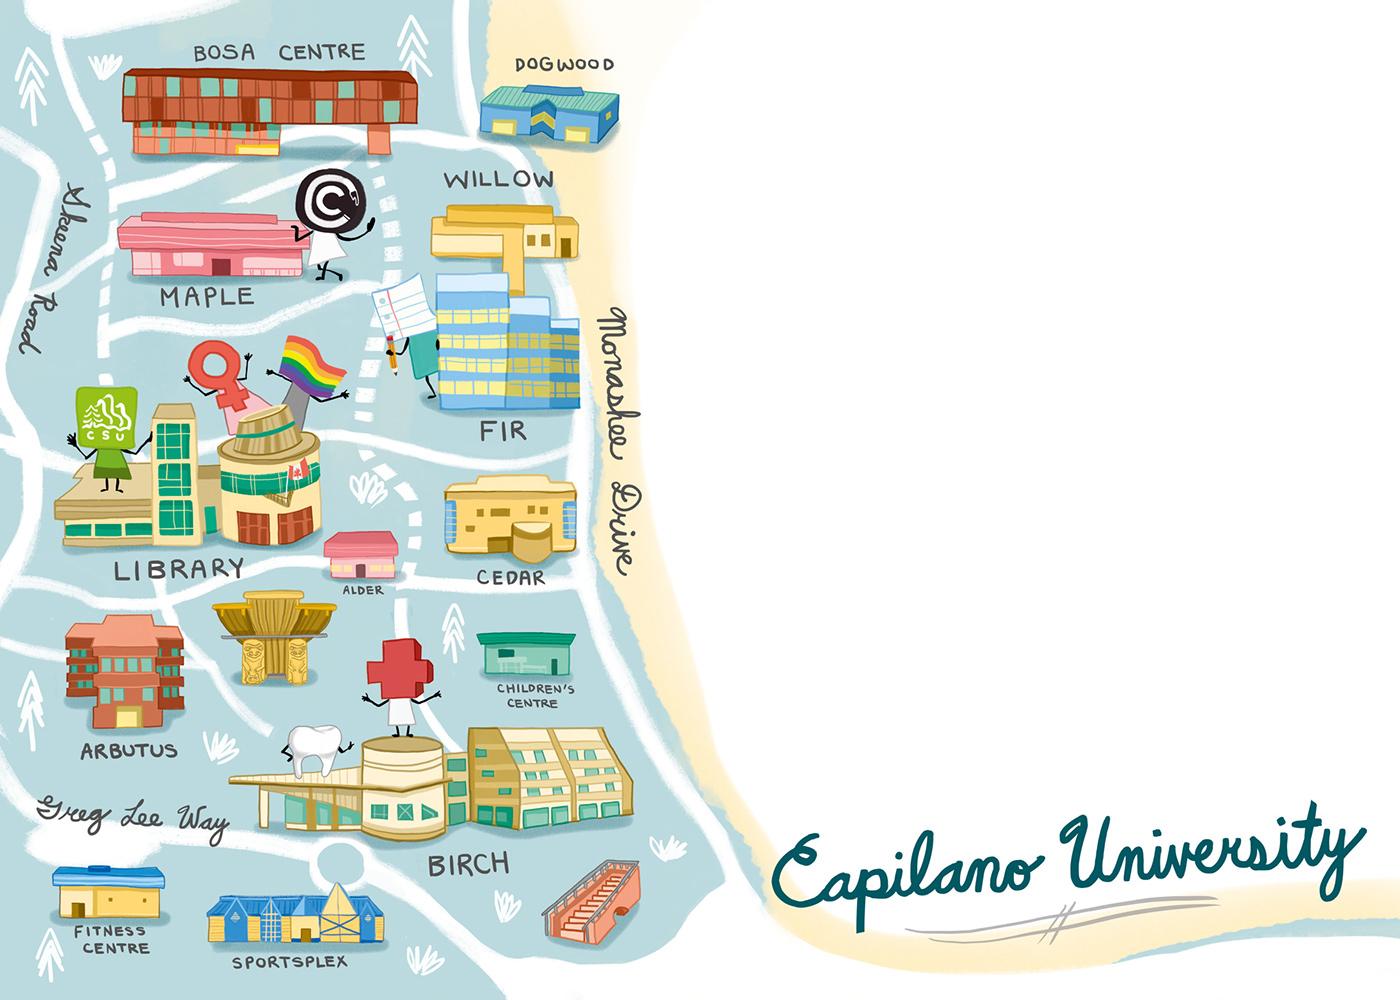 Capilano University Map Capilano University Illustrated Map on Behance